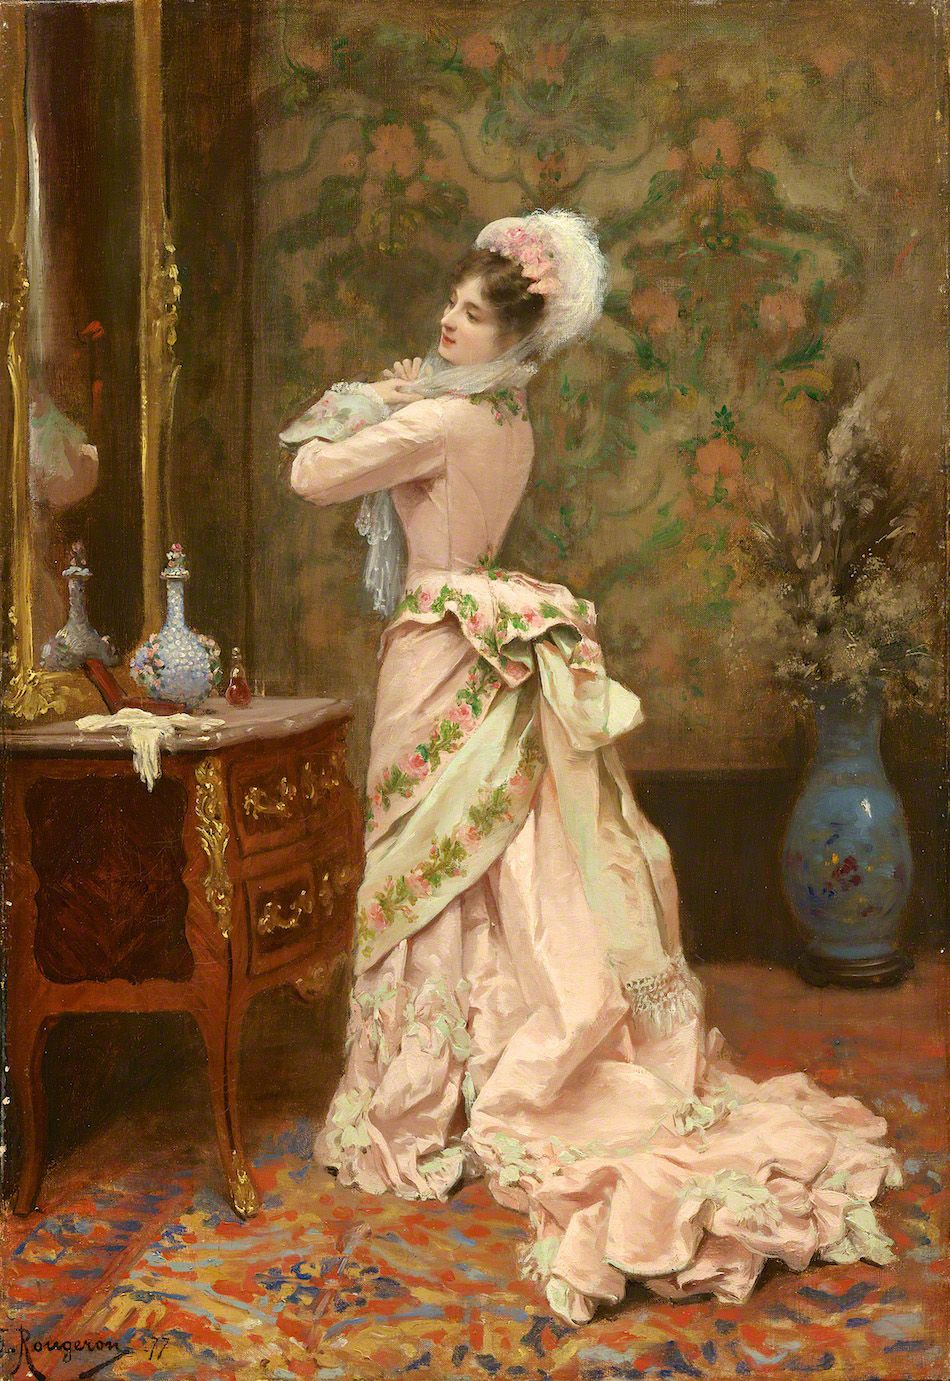 Toilette by jules james rougeron trajes epoca victoriana